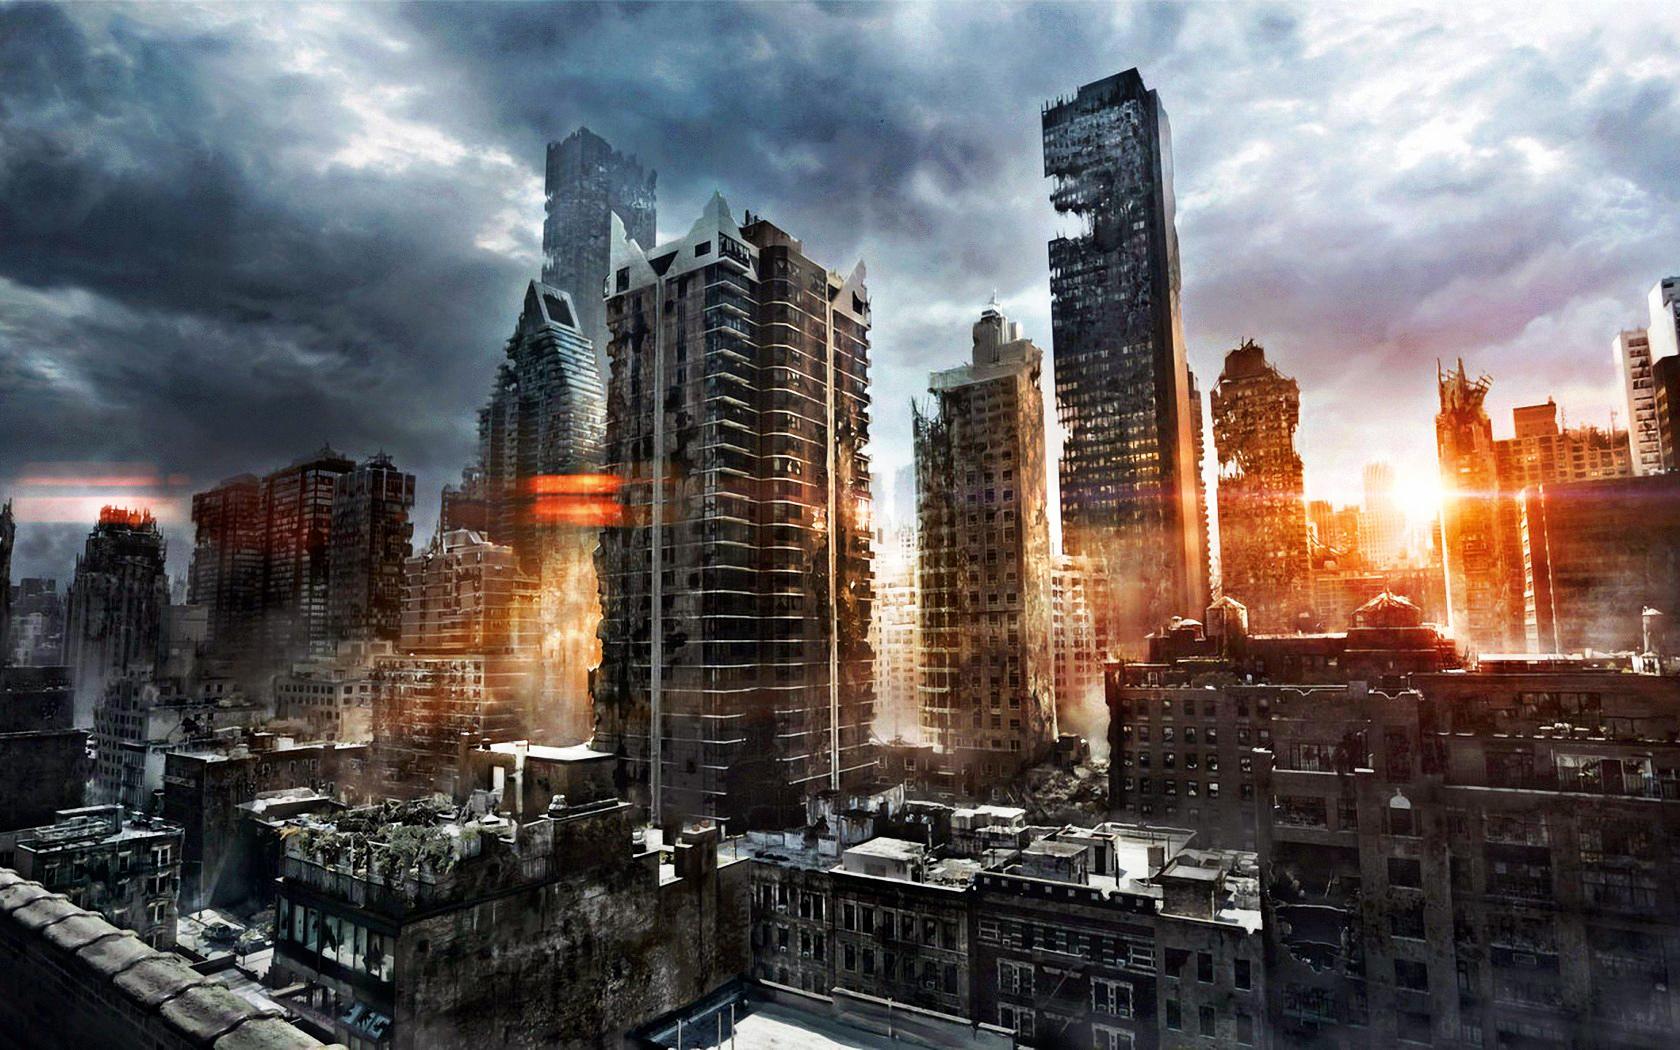 Image   Sunrise destroyed city wallpaperjpg   The Savage Lands 1680x1050